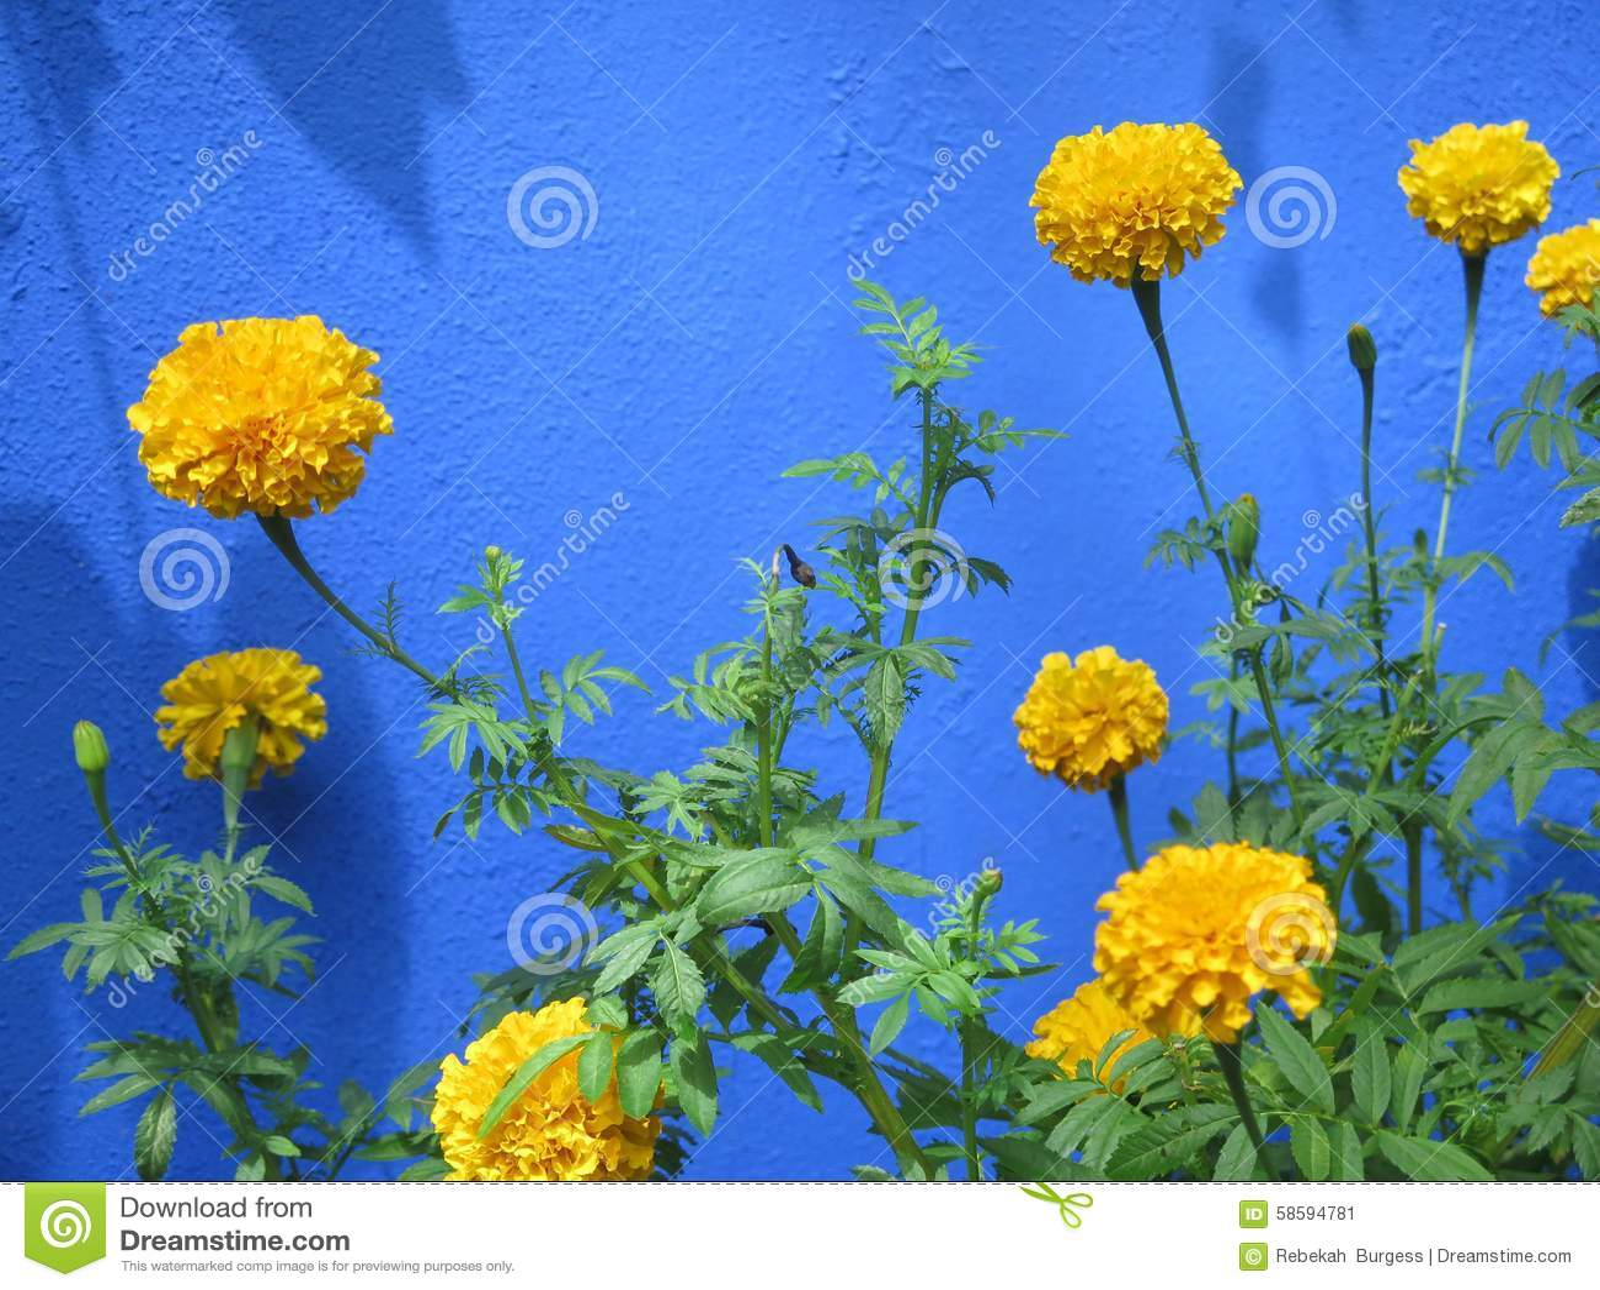 Marigolds Stock Image Image Of Gardening Bloom Wall 58594781